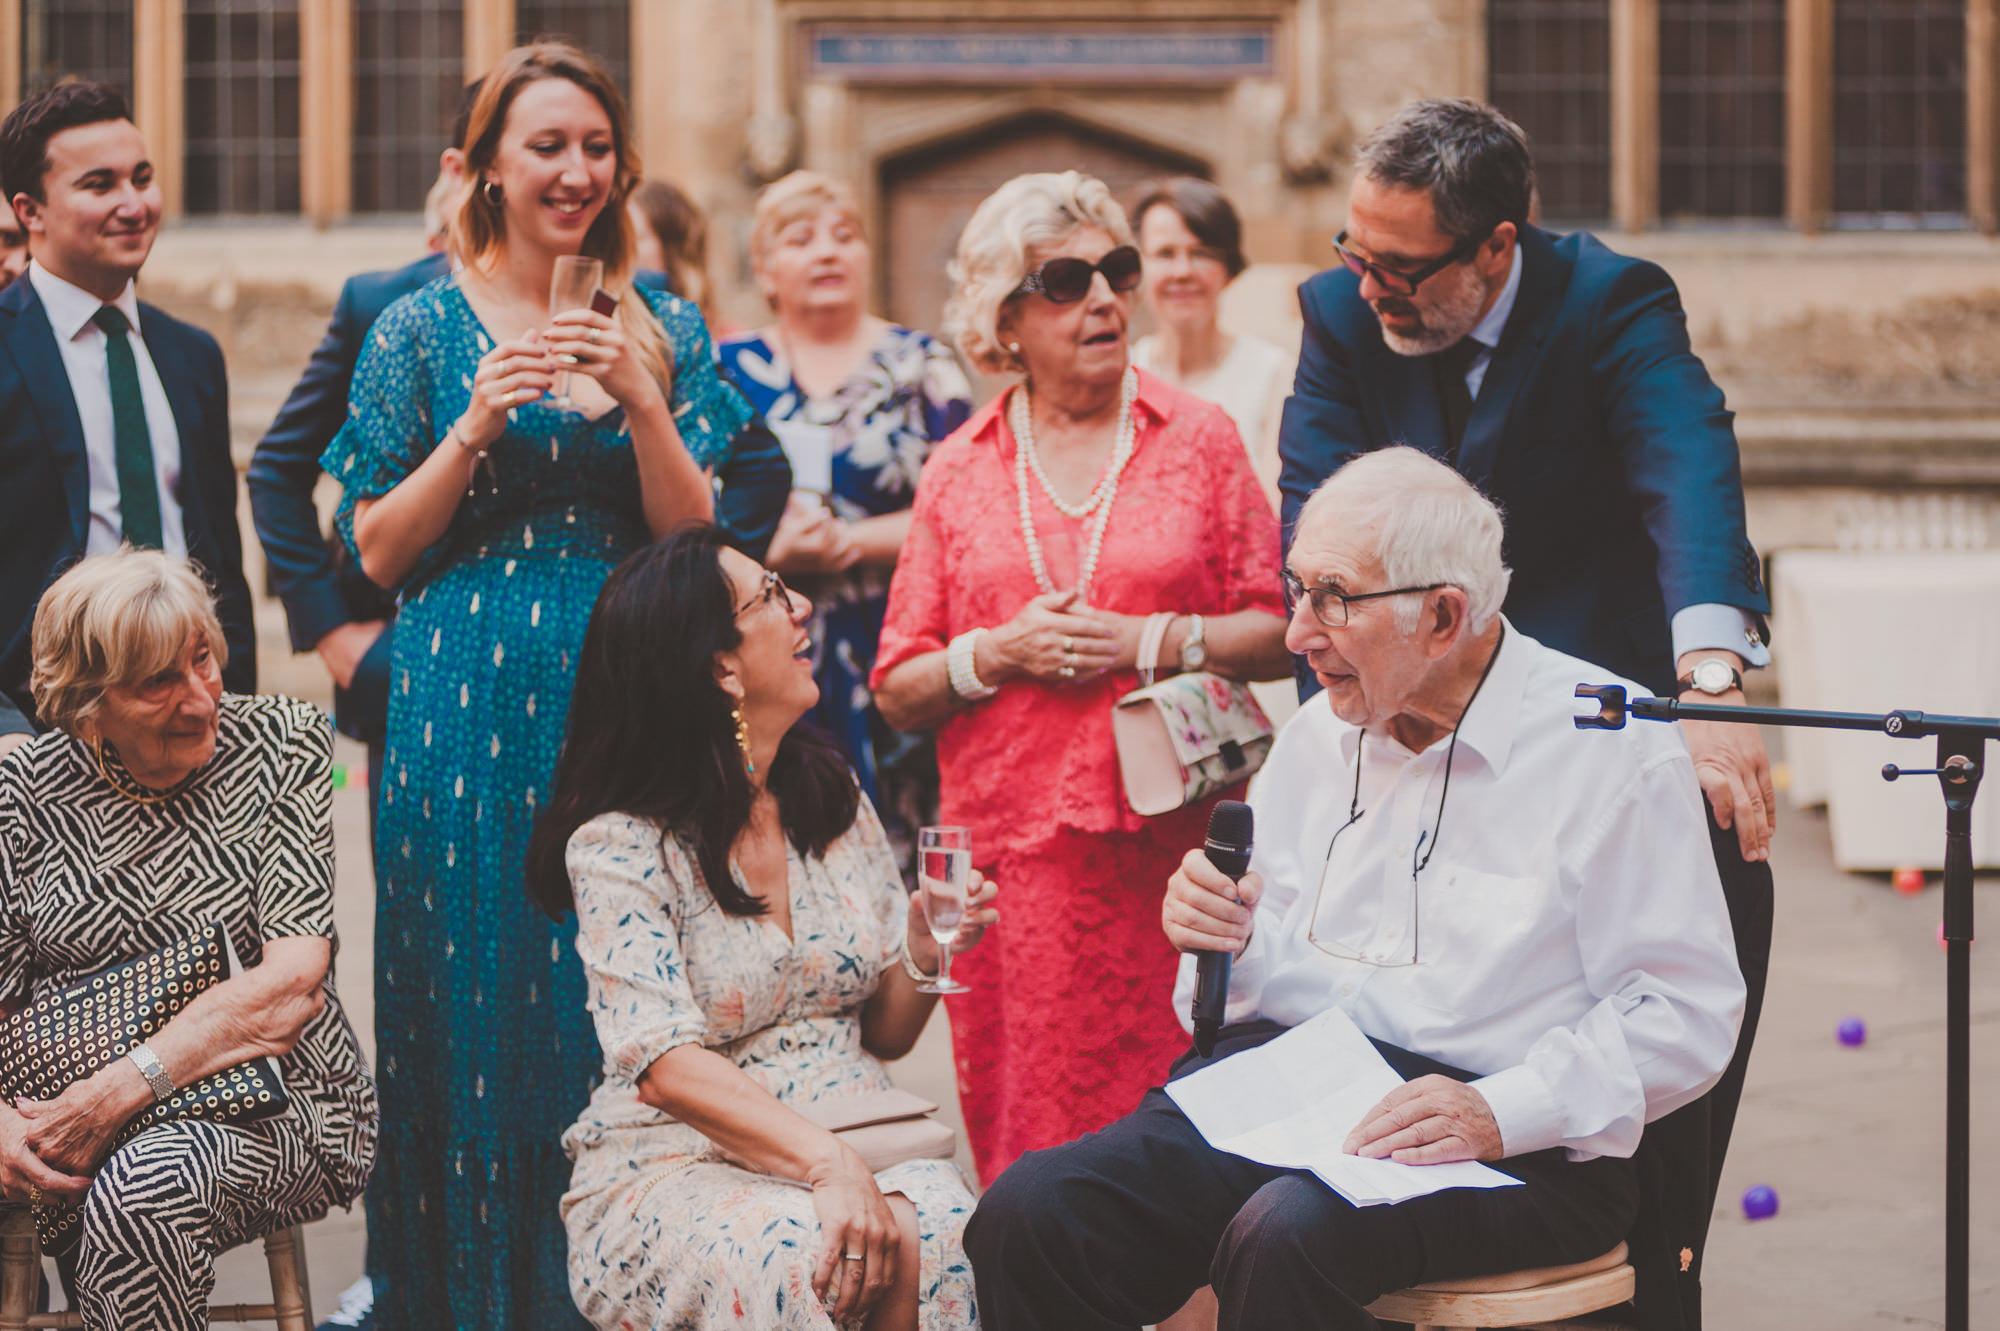 oxford-university-weddings